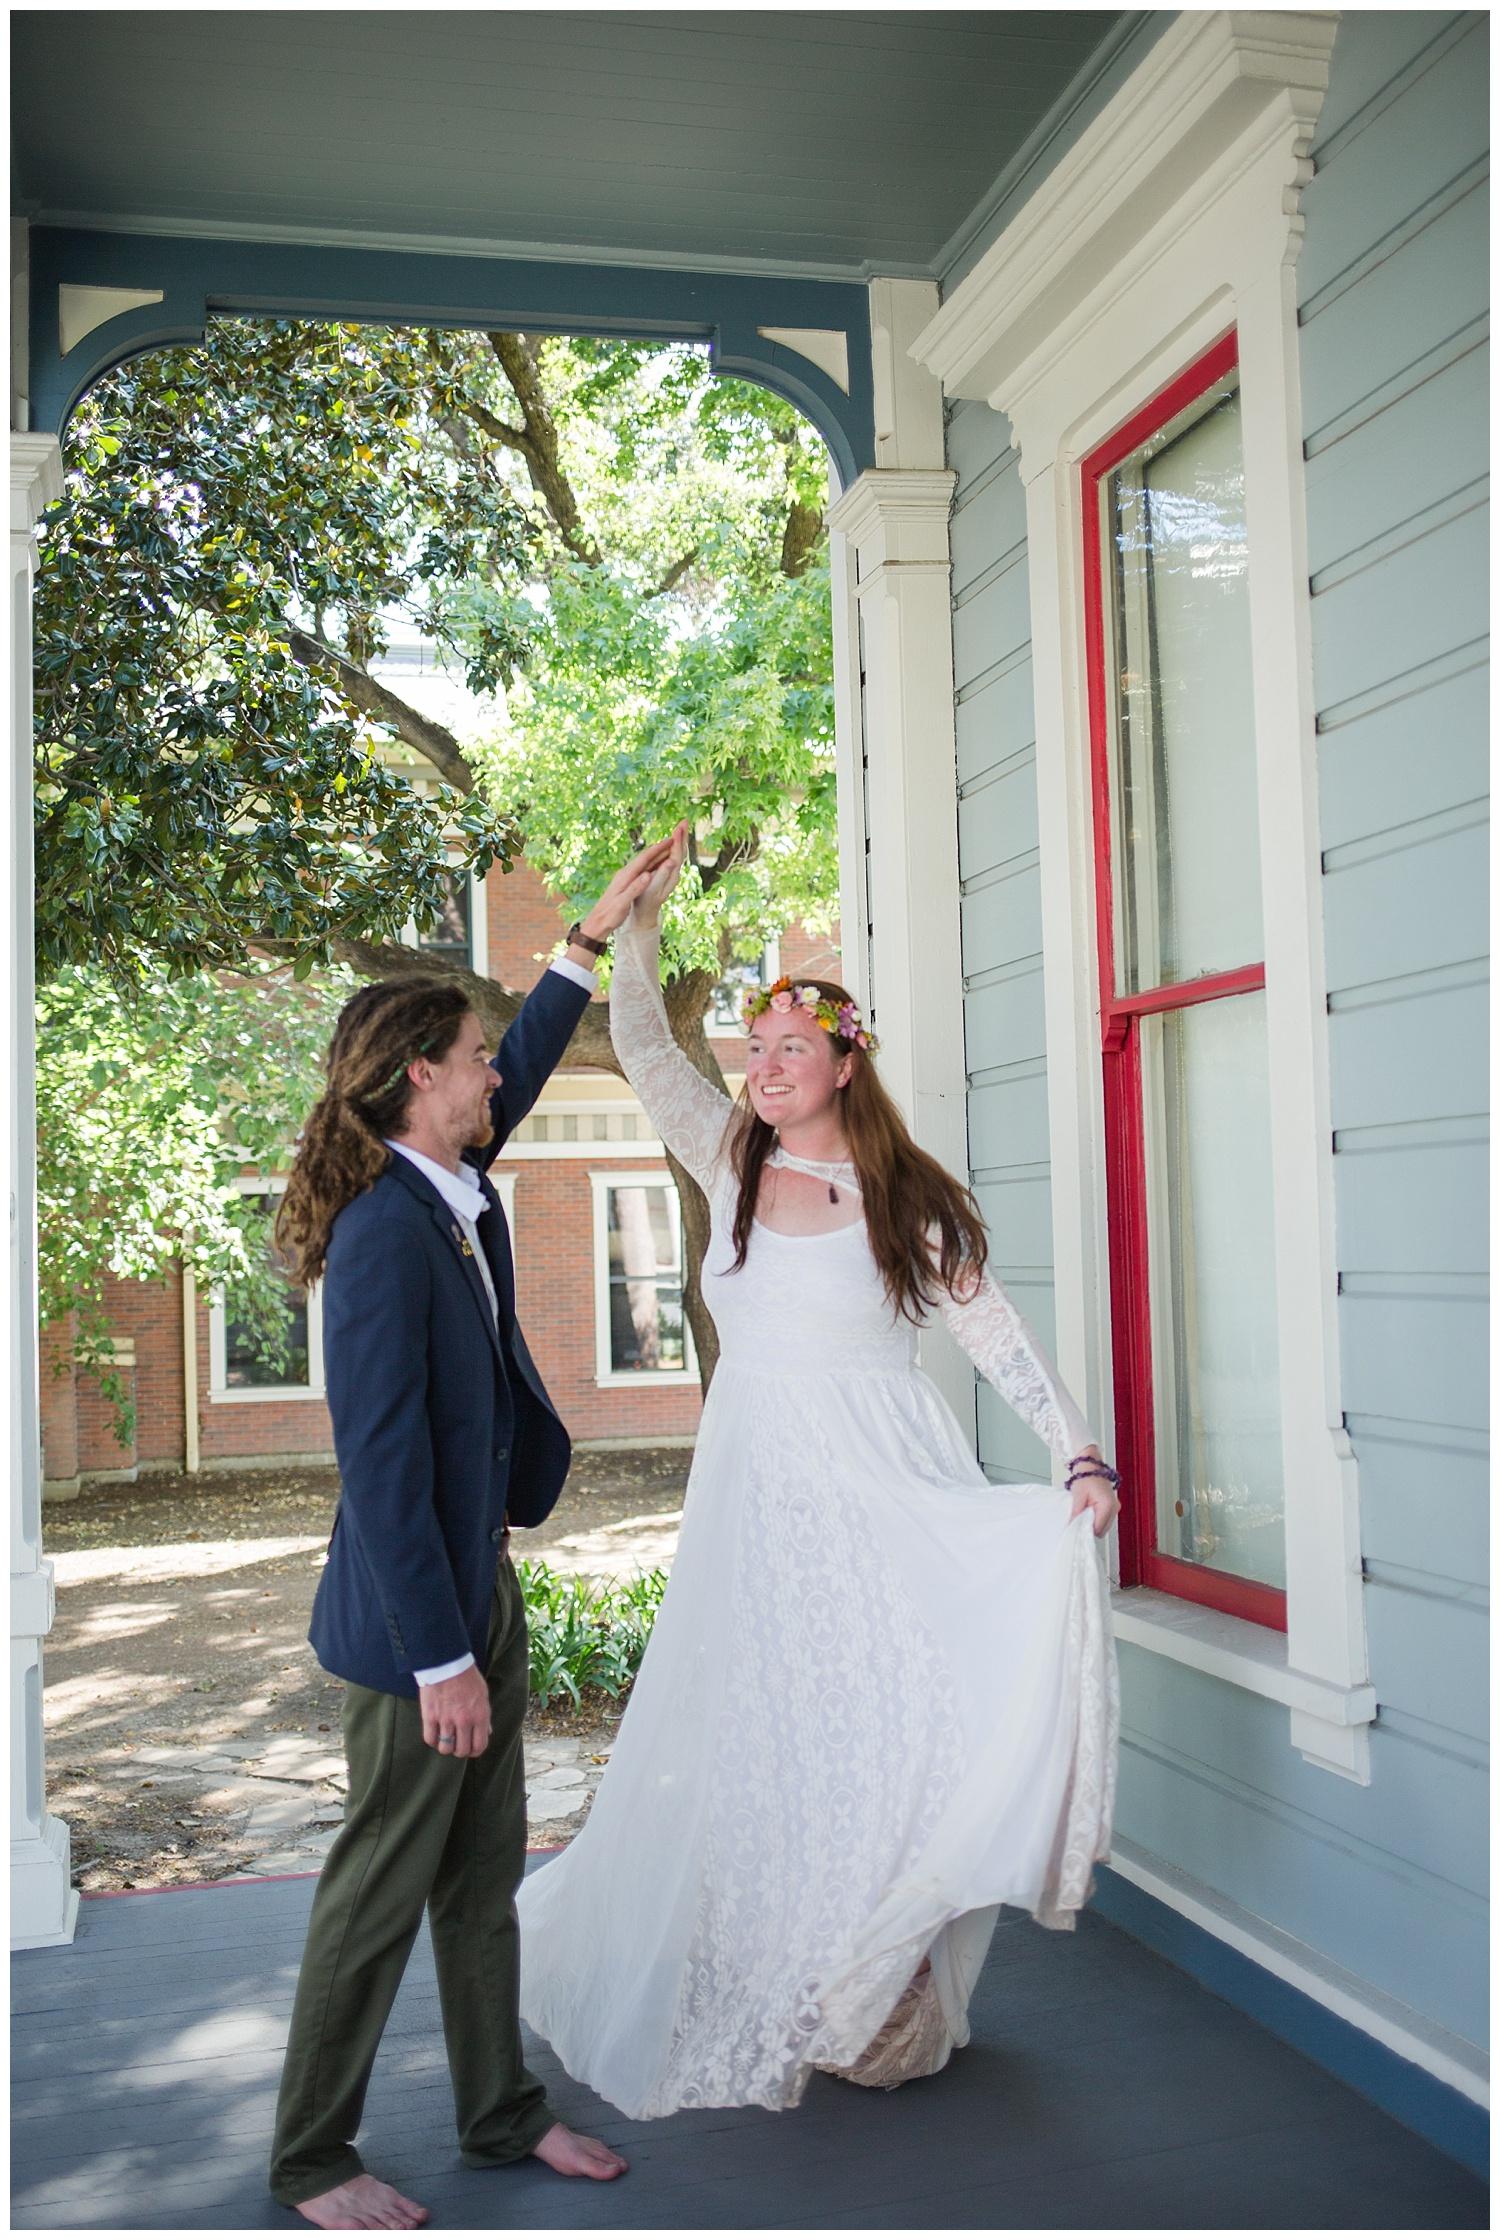 _81A7573_060218_Devaney-Frice_Renoda Campbell Photography_Wedding Photography.jpg